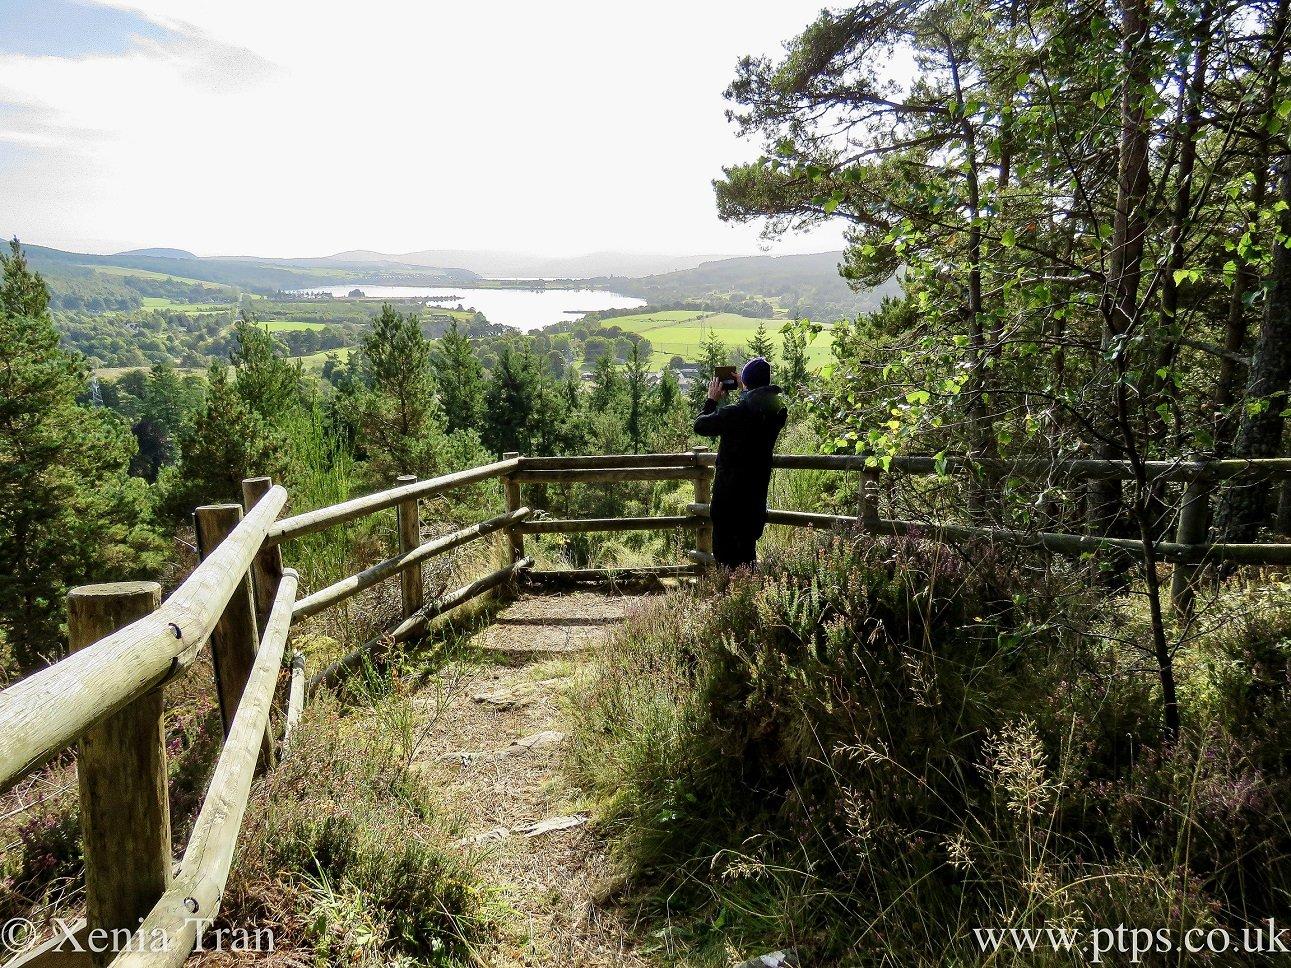 Paul Tran taking a photograph at a viewpoint